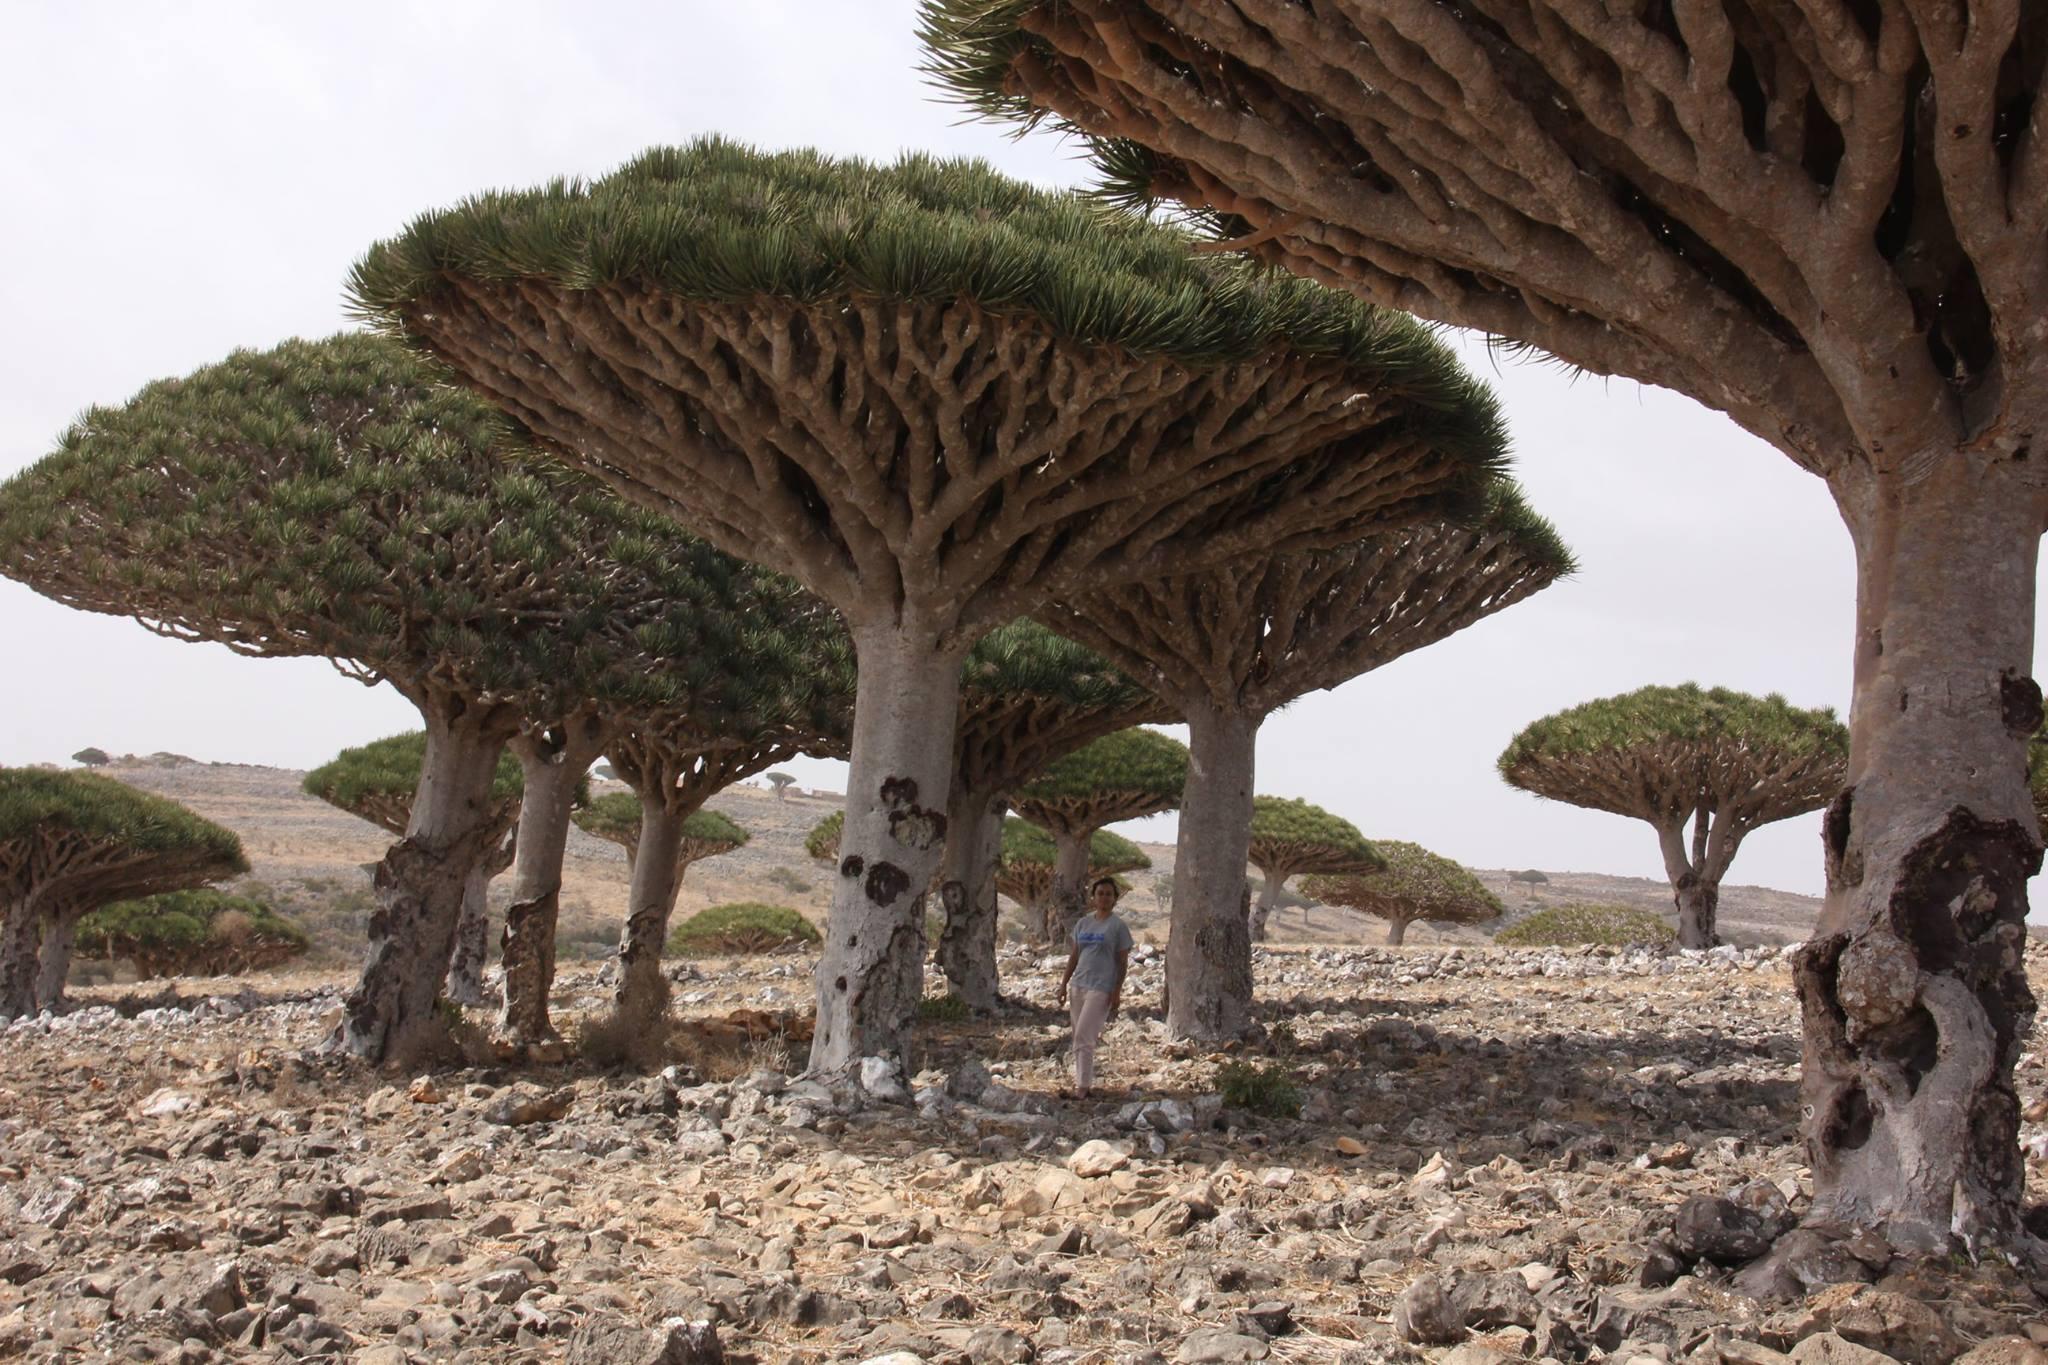 #Yemen #Yementourism #Socotraisland #Blooddragontrees